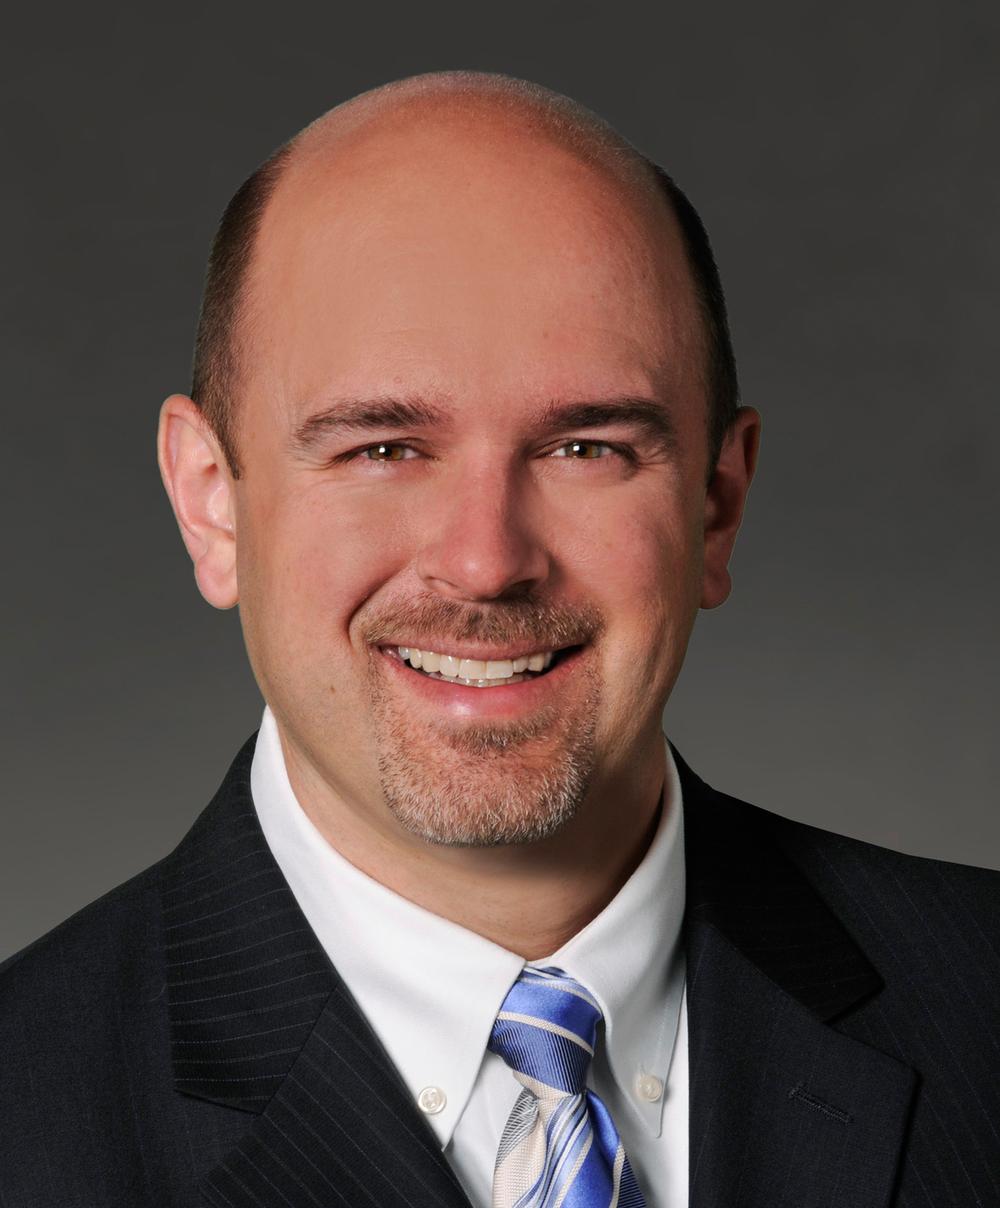 Dave St. John-Larkin  Partner Perkins Coie, LLP   LinkedIn